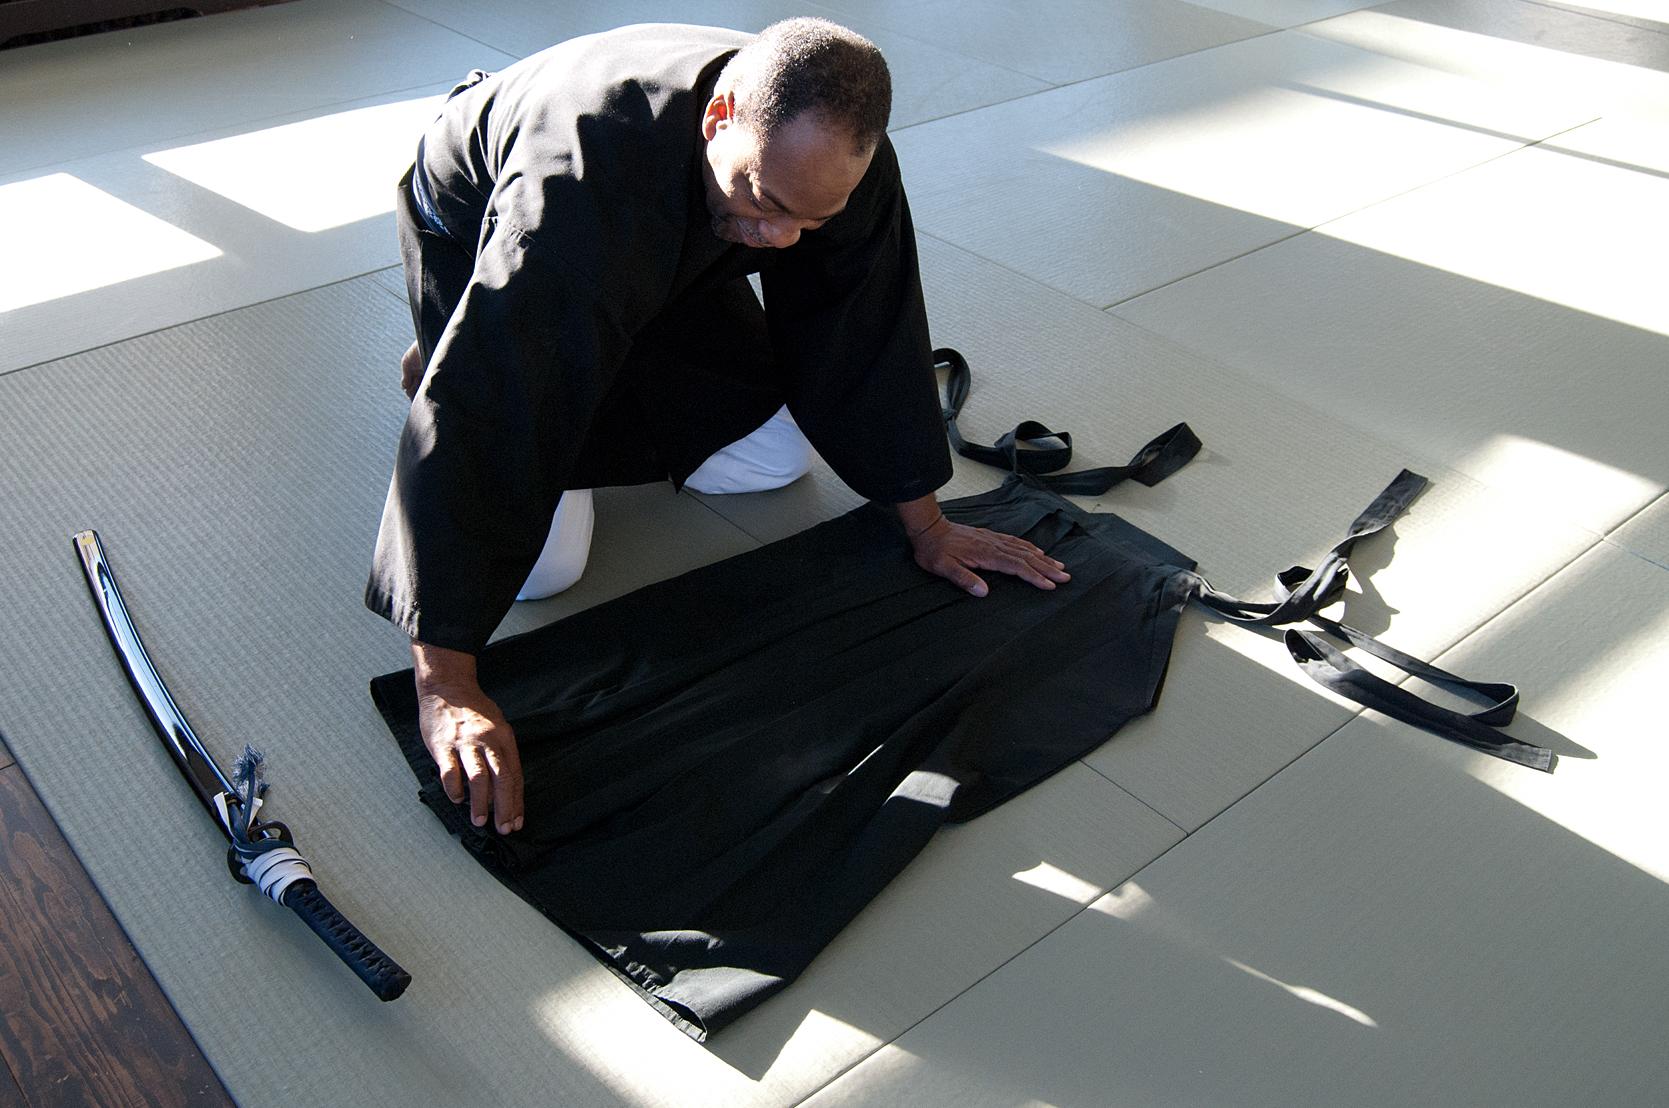 40_swordsmanship_aikido-westchester-ny.jpg